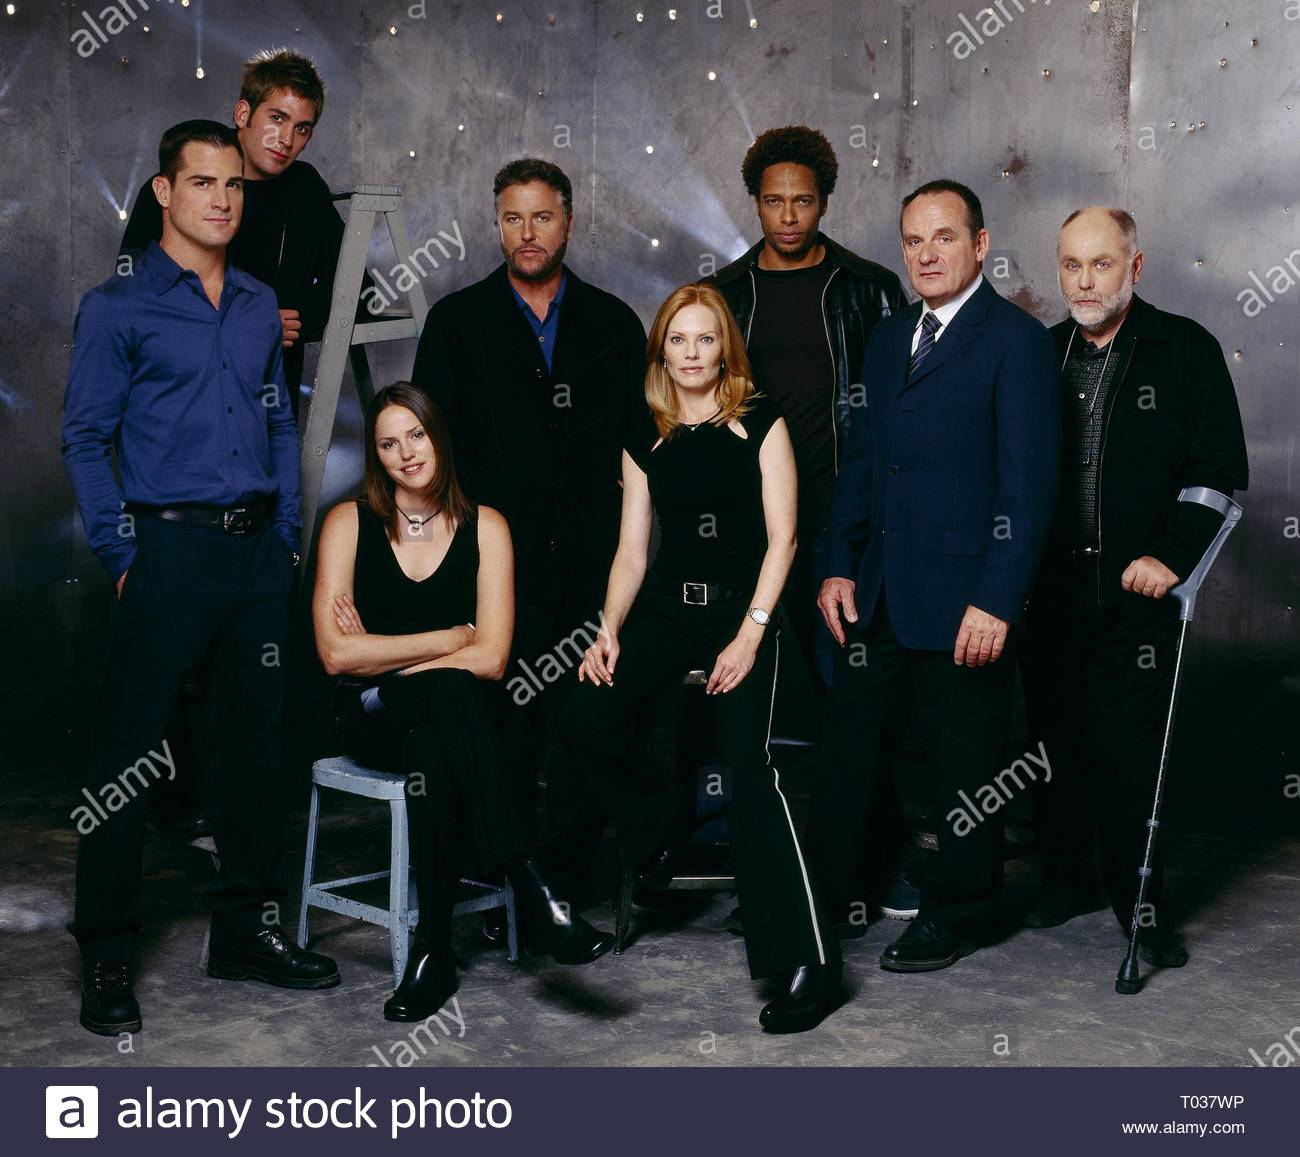 GEORGE EADS, ERIC SZMANDA, JORJA FOX, WILLIAM L. PETERSEN, MARG HELGENBERGER, GARY DOURDAN, PAUL GUILFOYLE, ROBERT DAVID HALL Stock Photo